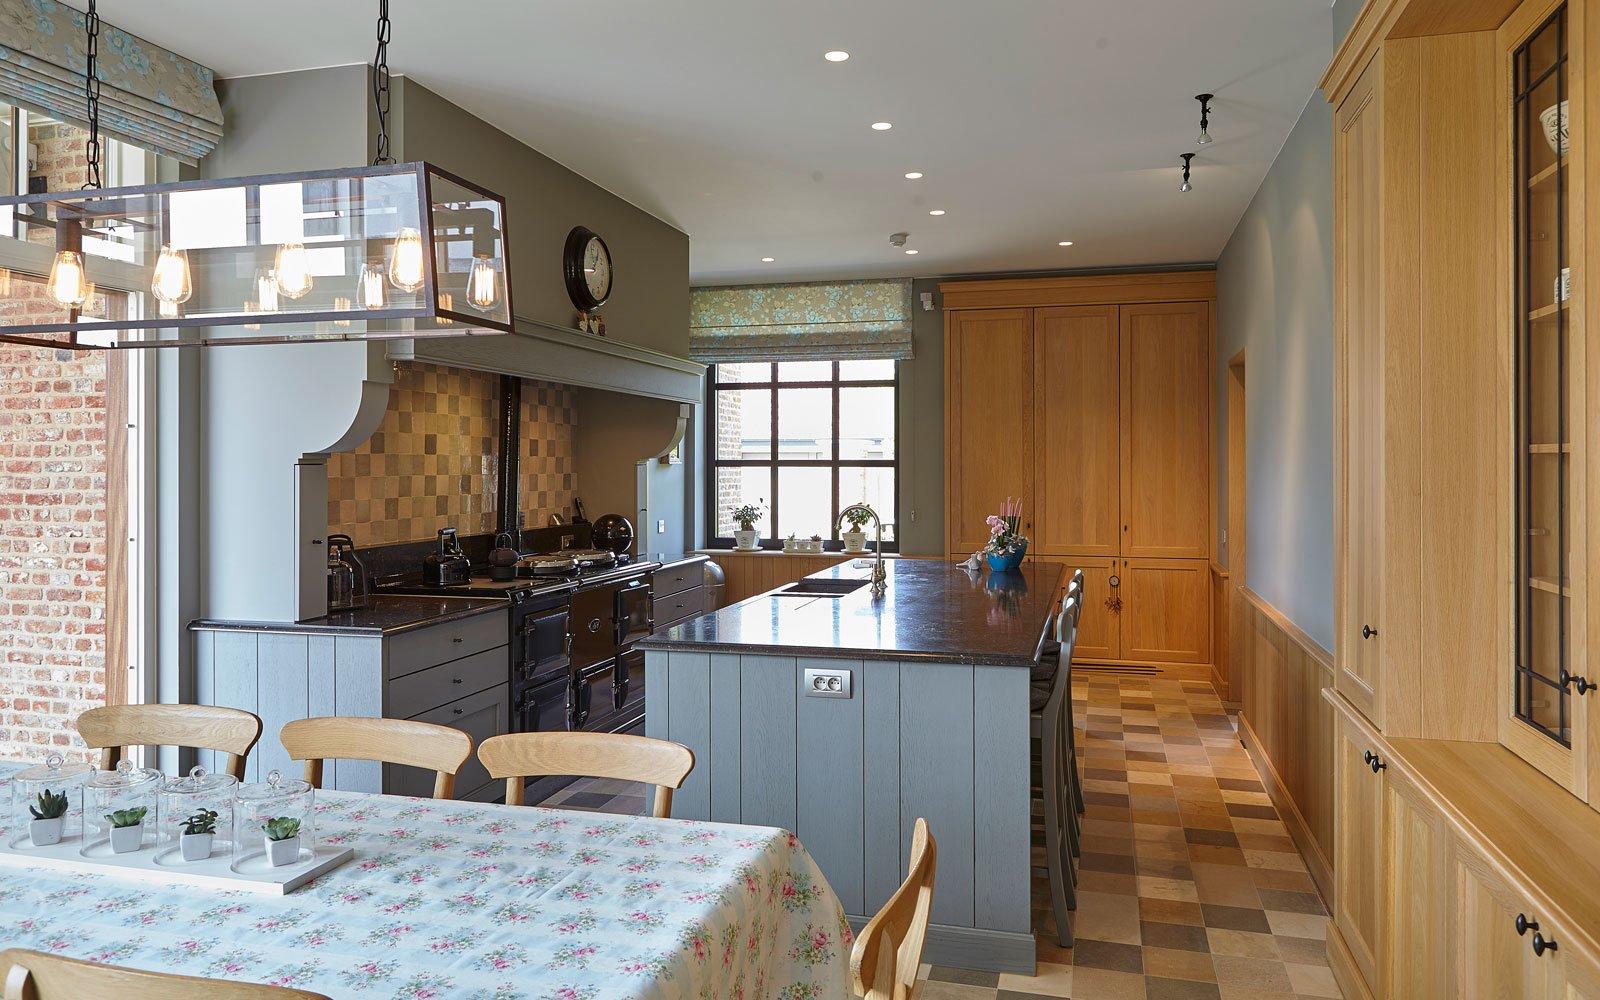 Keuken, maatwerk, kookeiland, Frank Tack Interieurbouw, eettafel, hout, Engelse cottage, Bart François